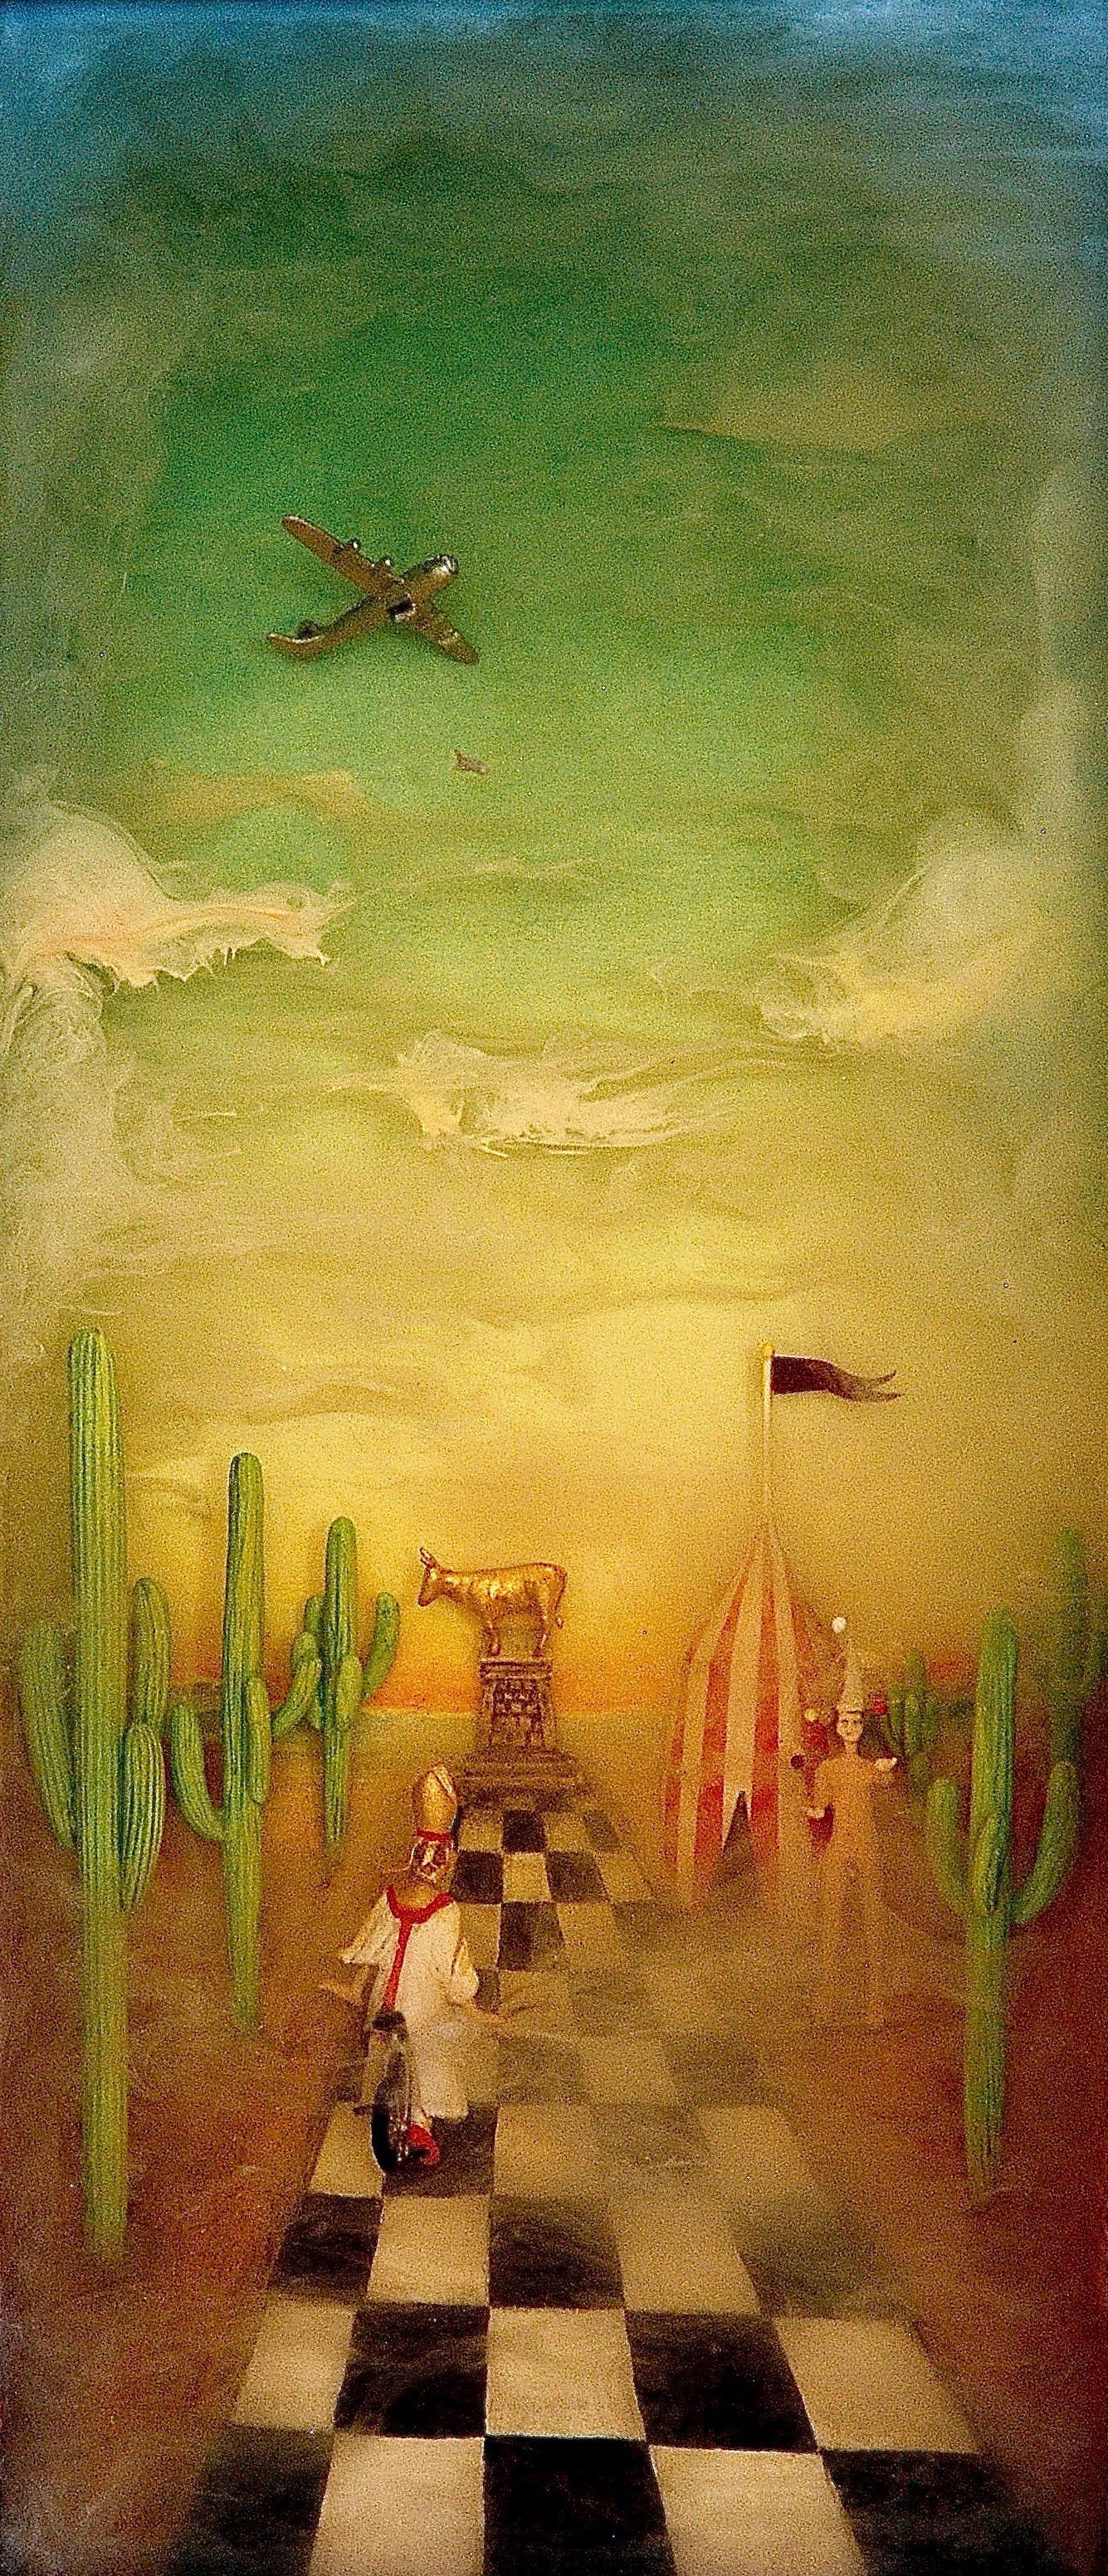 Thomas Coffin - Enola Gay Sunrise (detail)